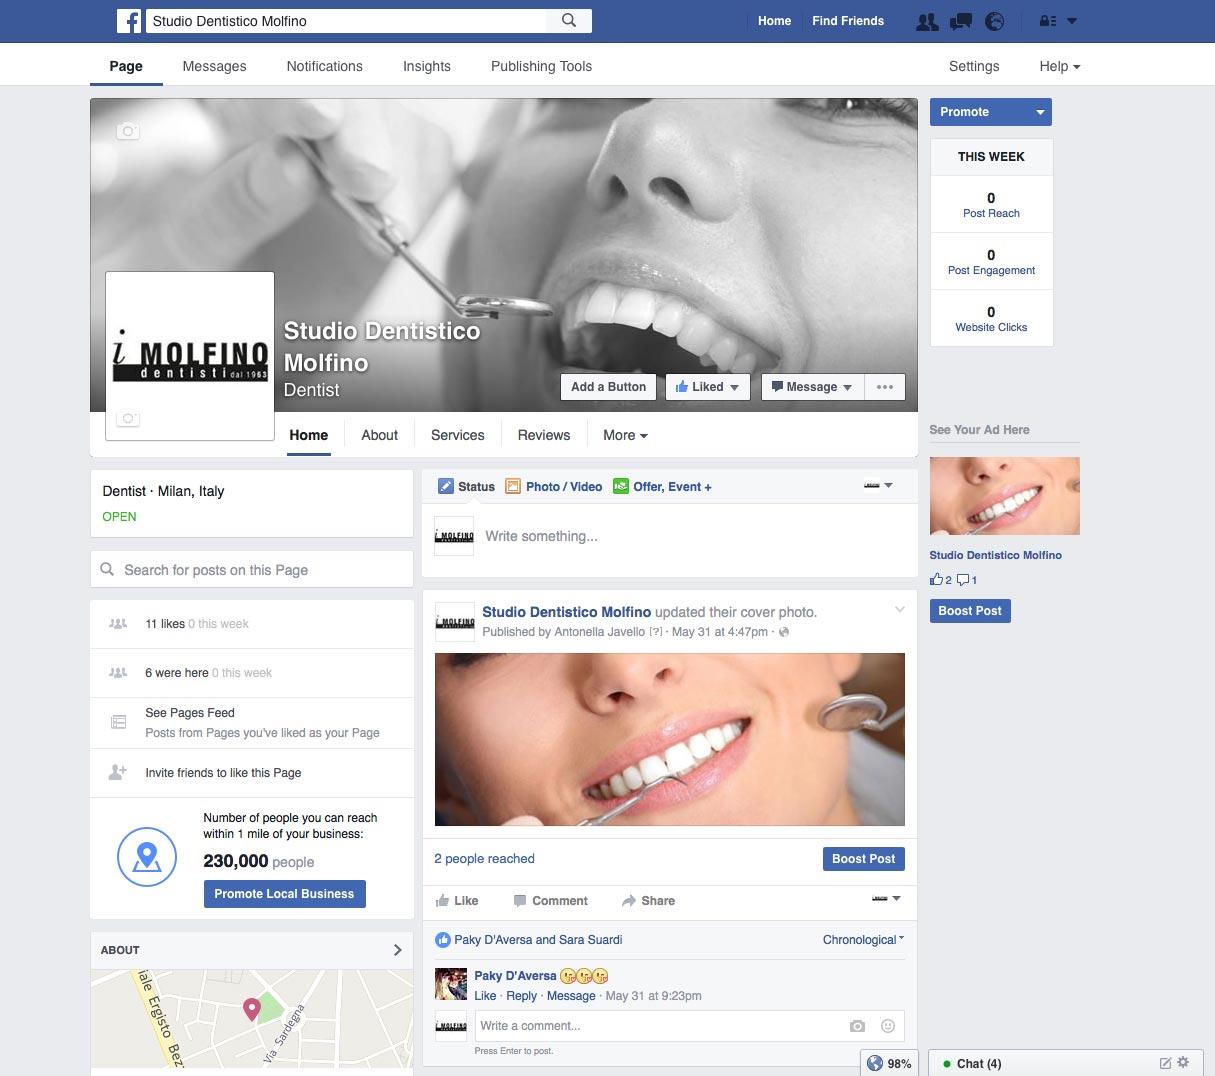 Studio Dentistico Molfino Social Media Marketing